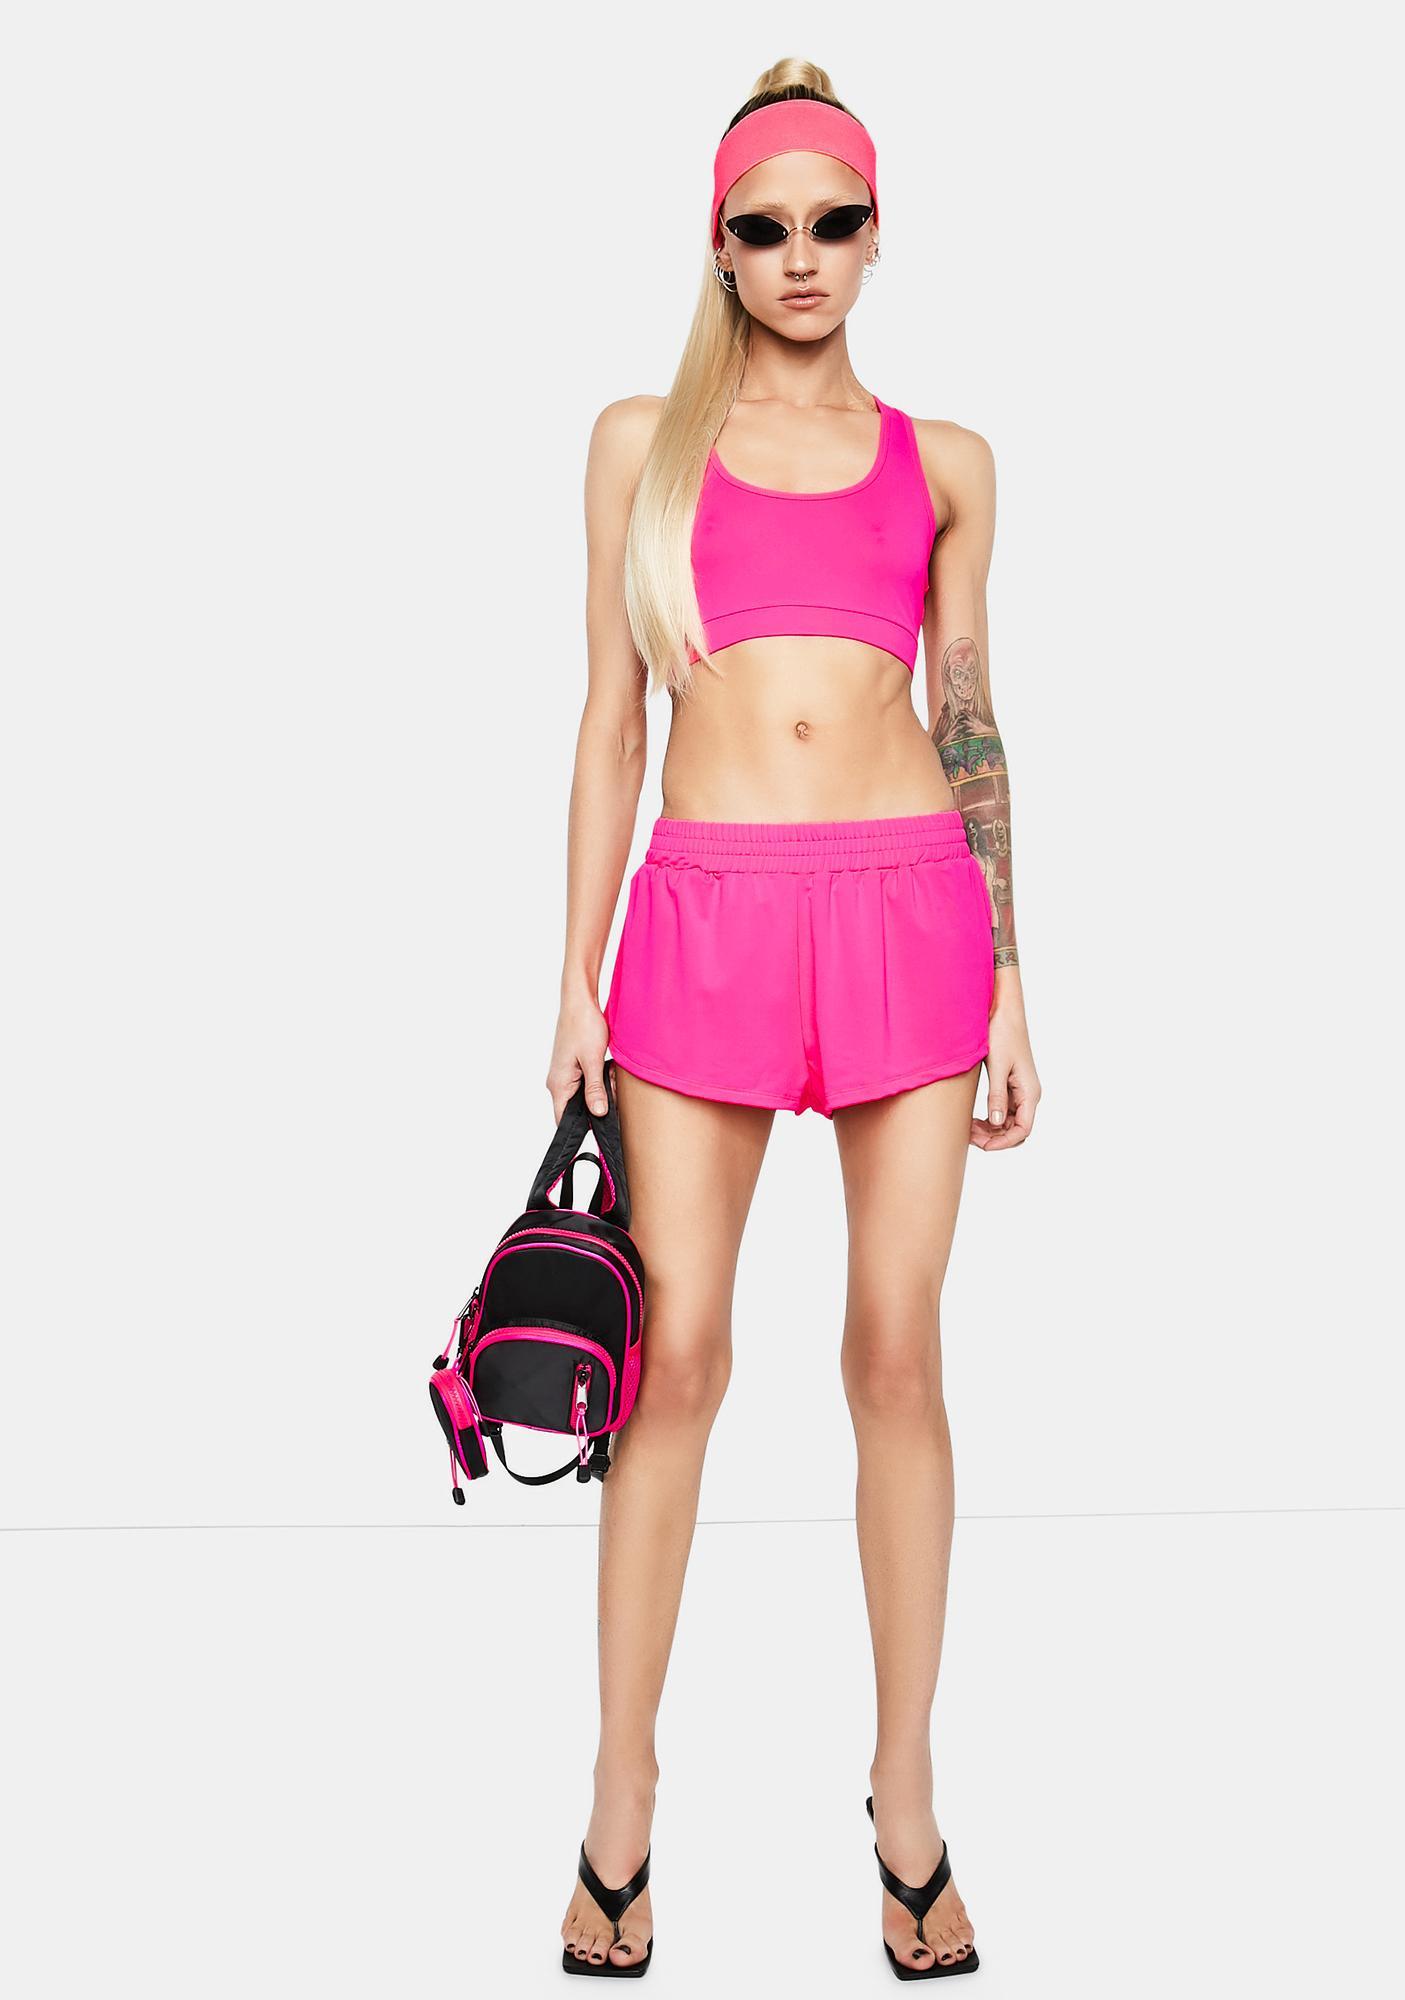 Club Exx Gym Bunny Mini Boxing Shorts